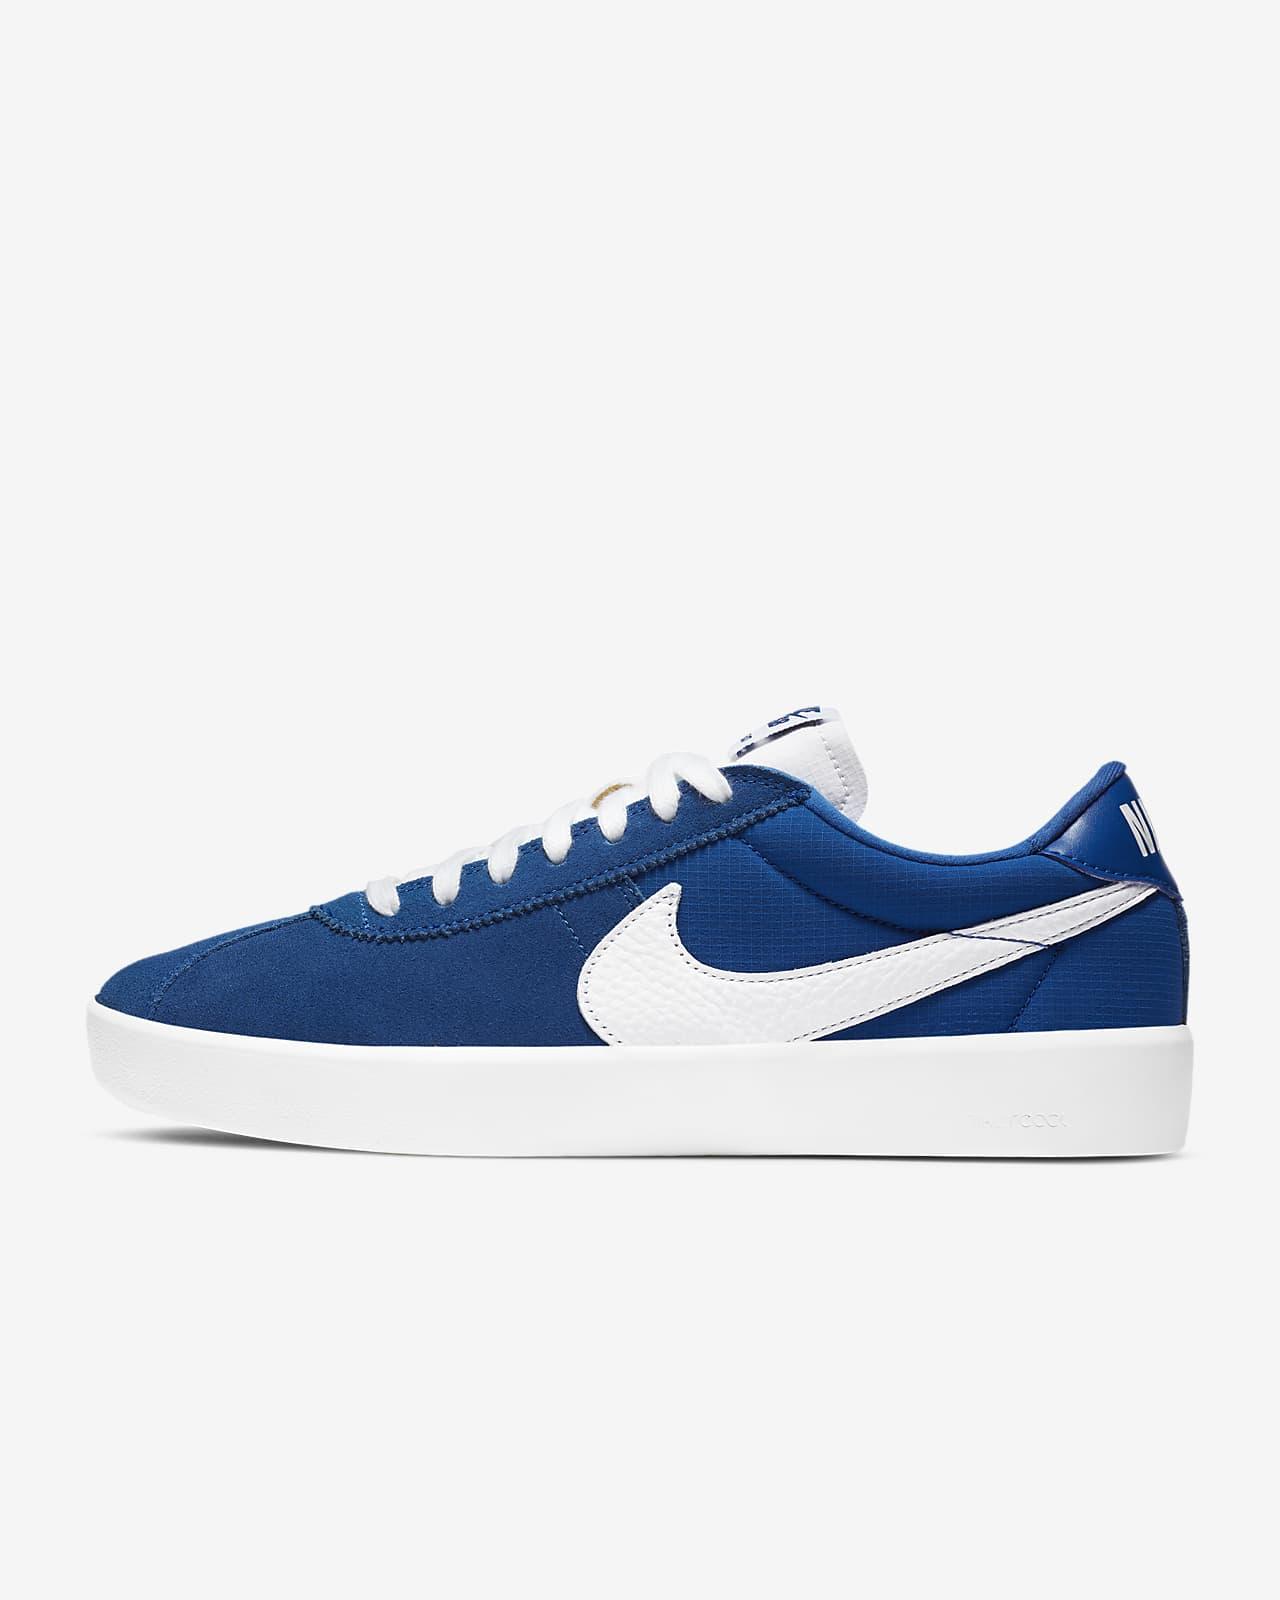 Chaussure de skateboard Nike SB Bruin React